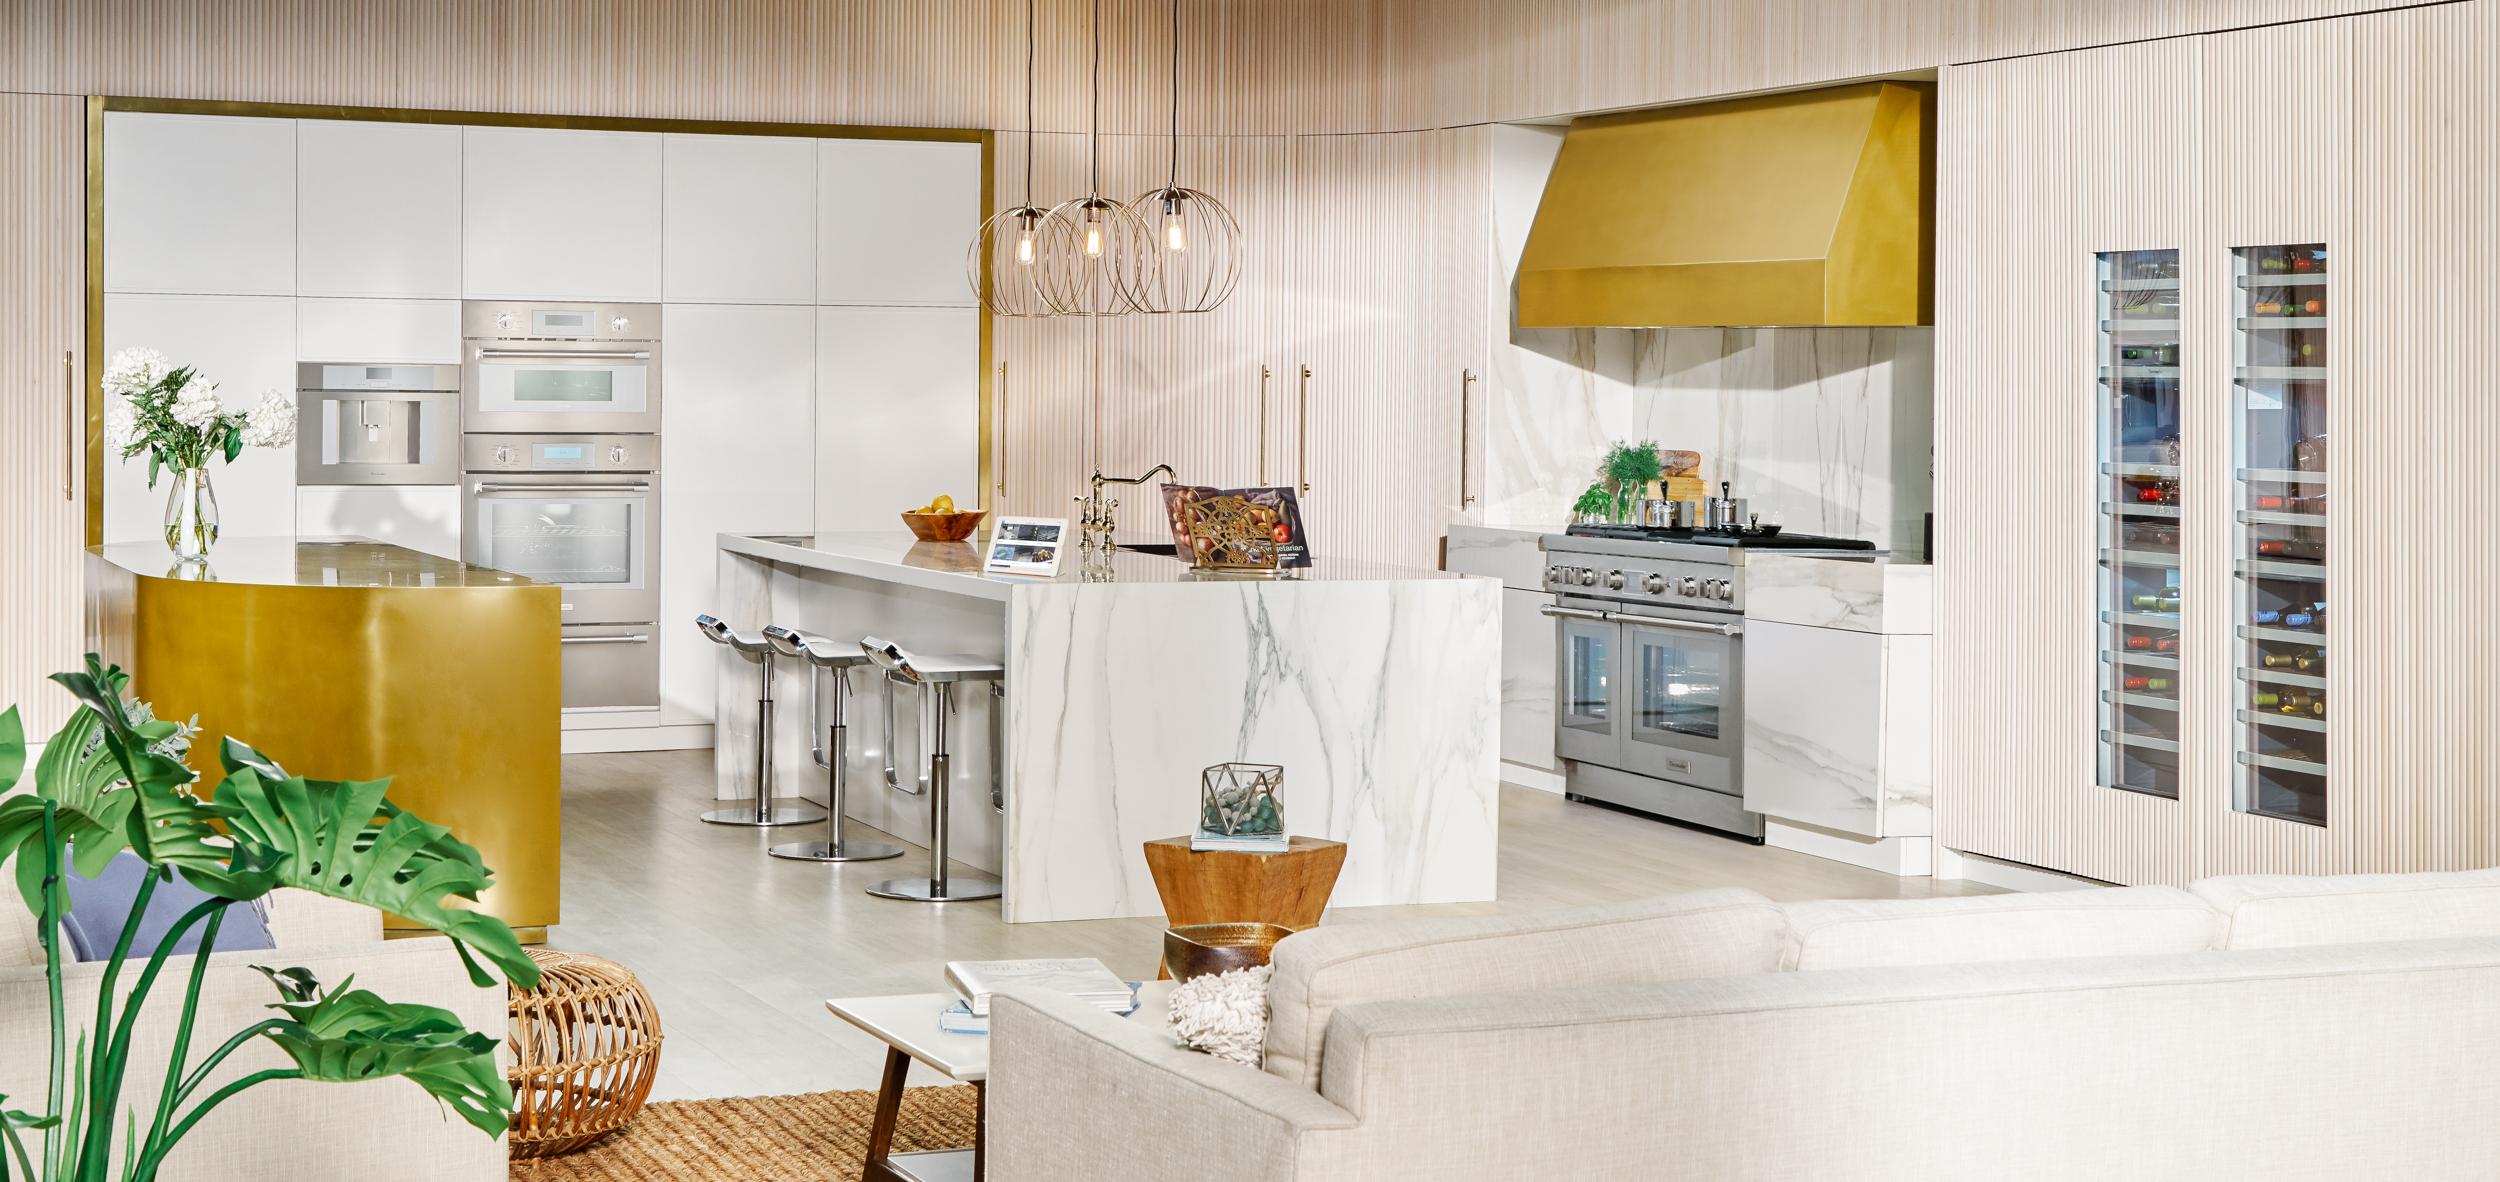 Thermador-30-inch-Pro-WallOven-T36IR900SP-white-kitchen-vignette-3-Edit.jpg